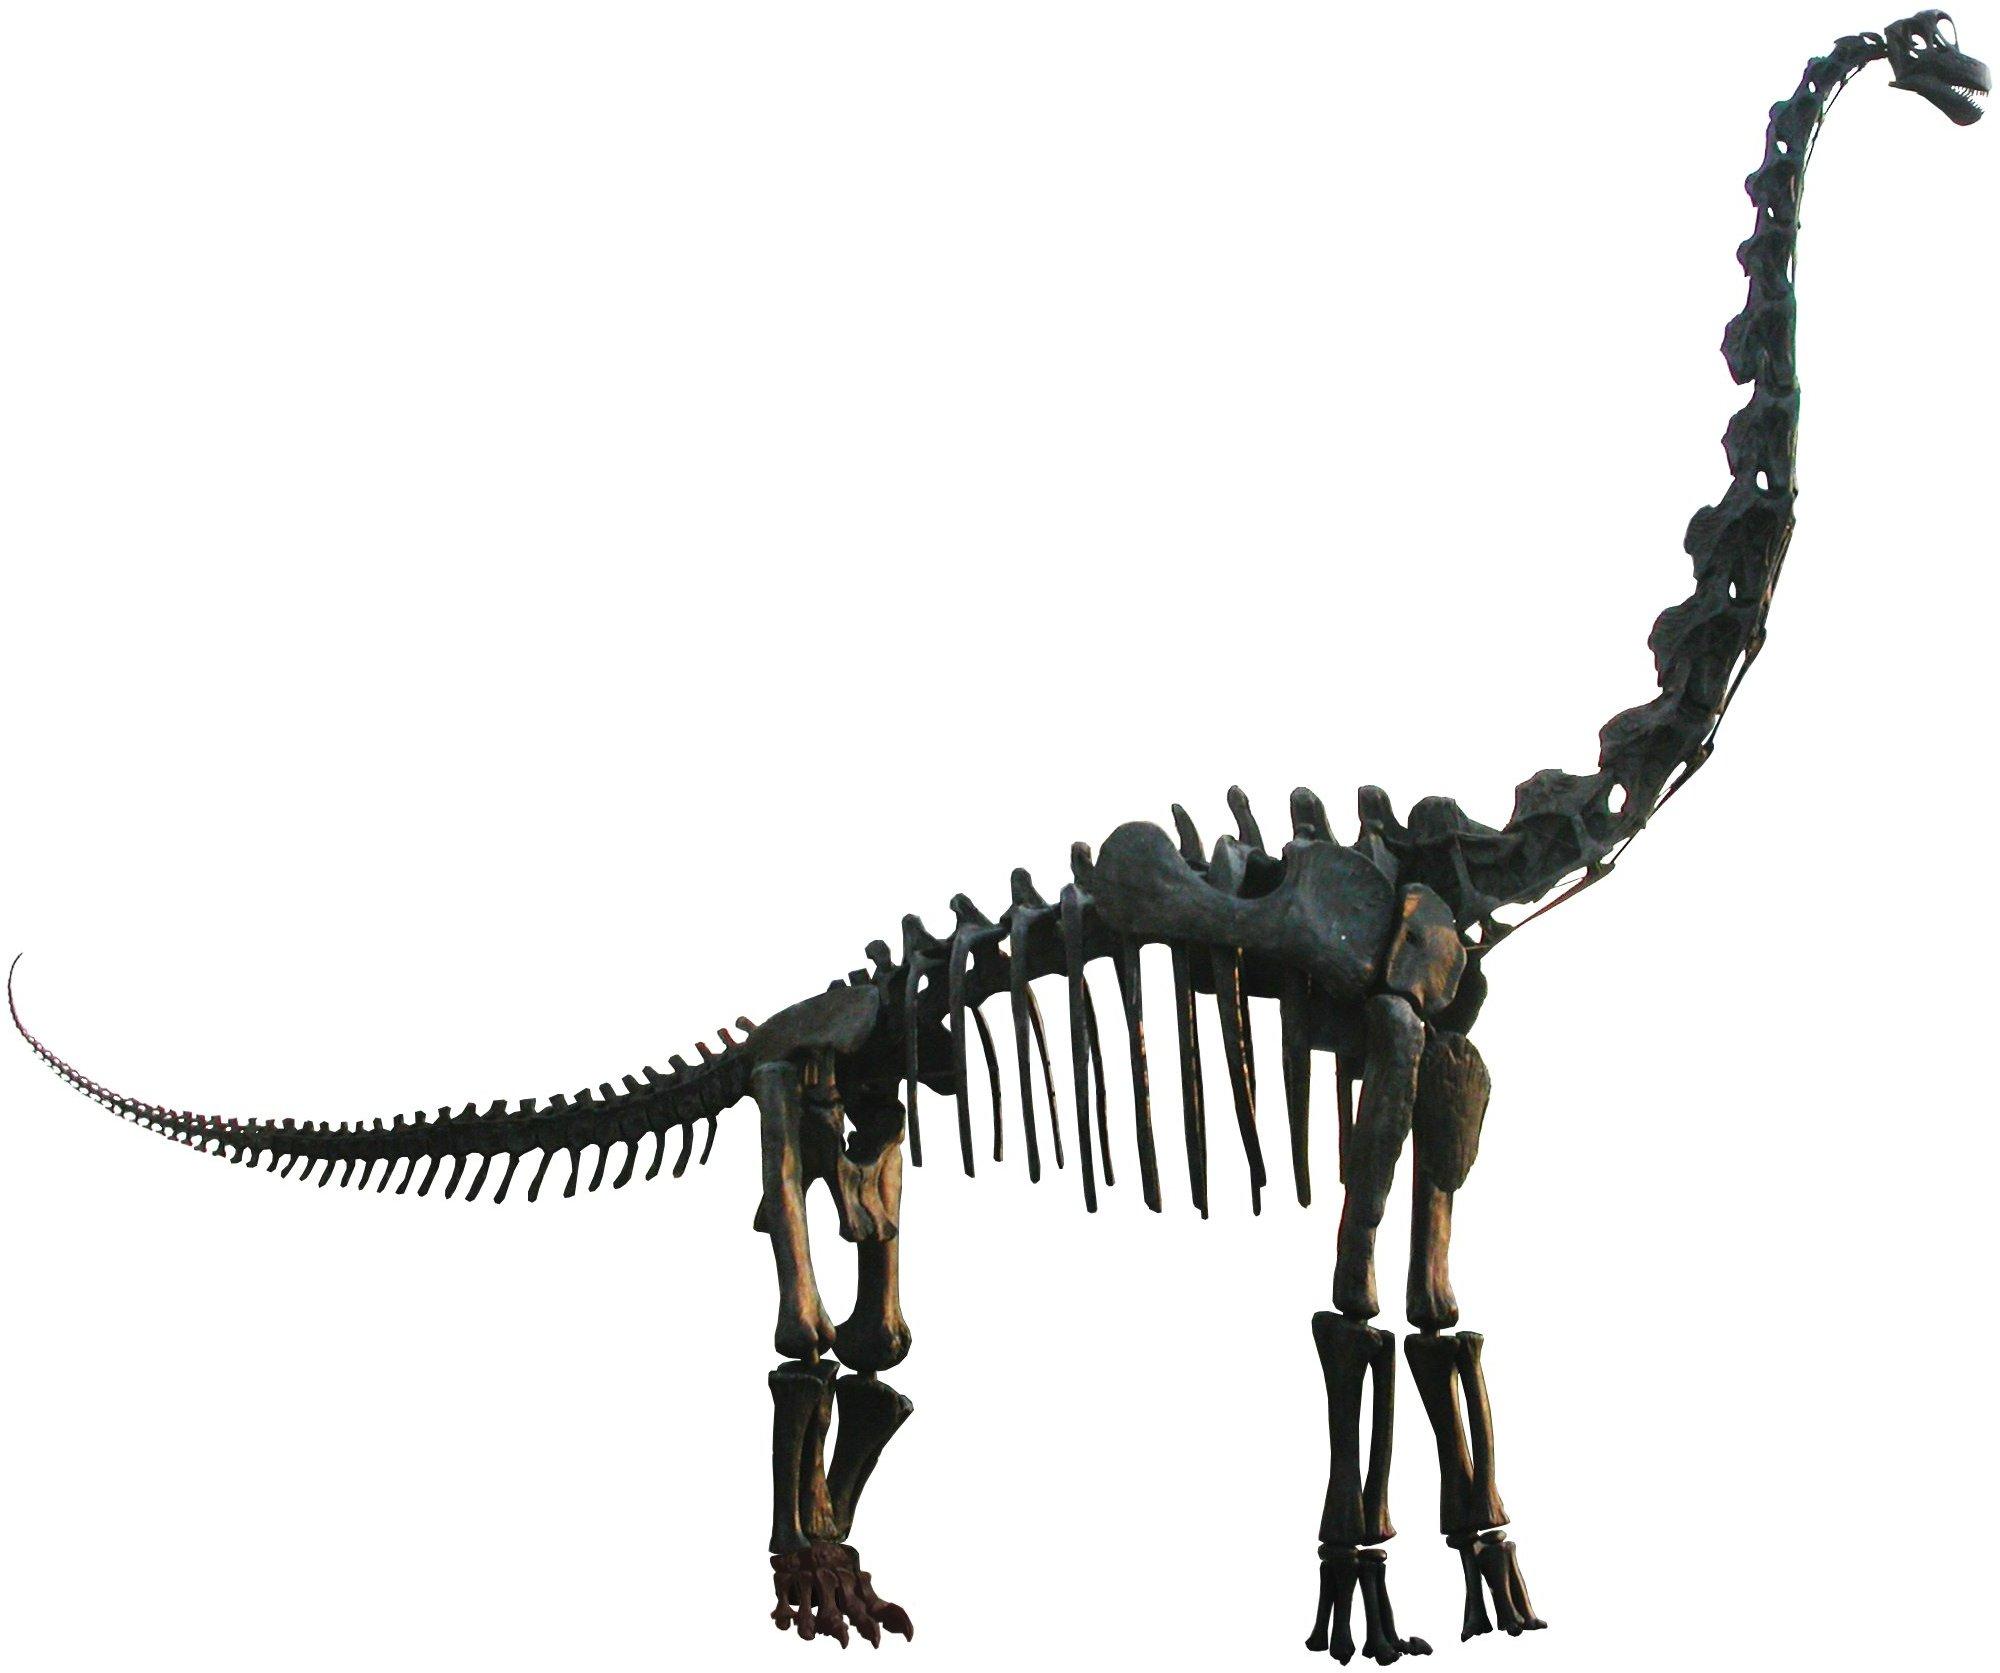 2000x1673 Brachiosaurus